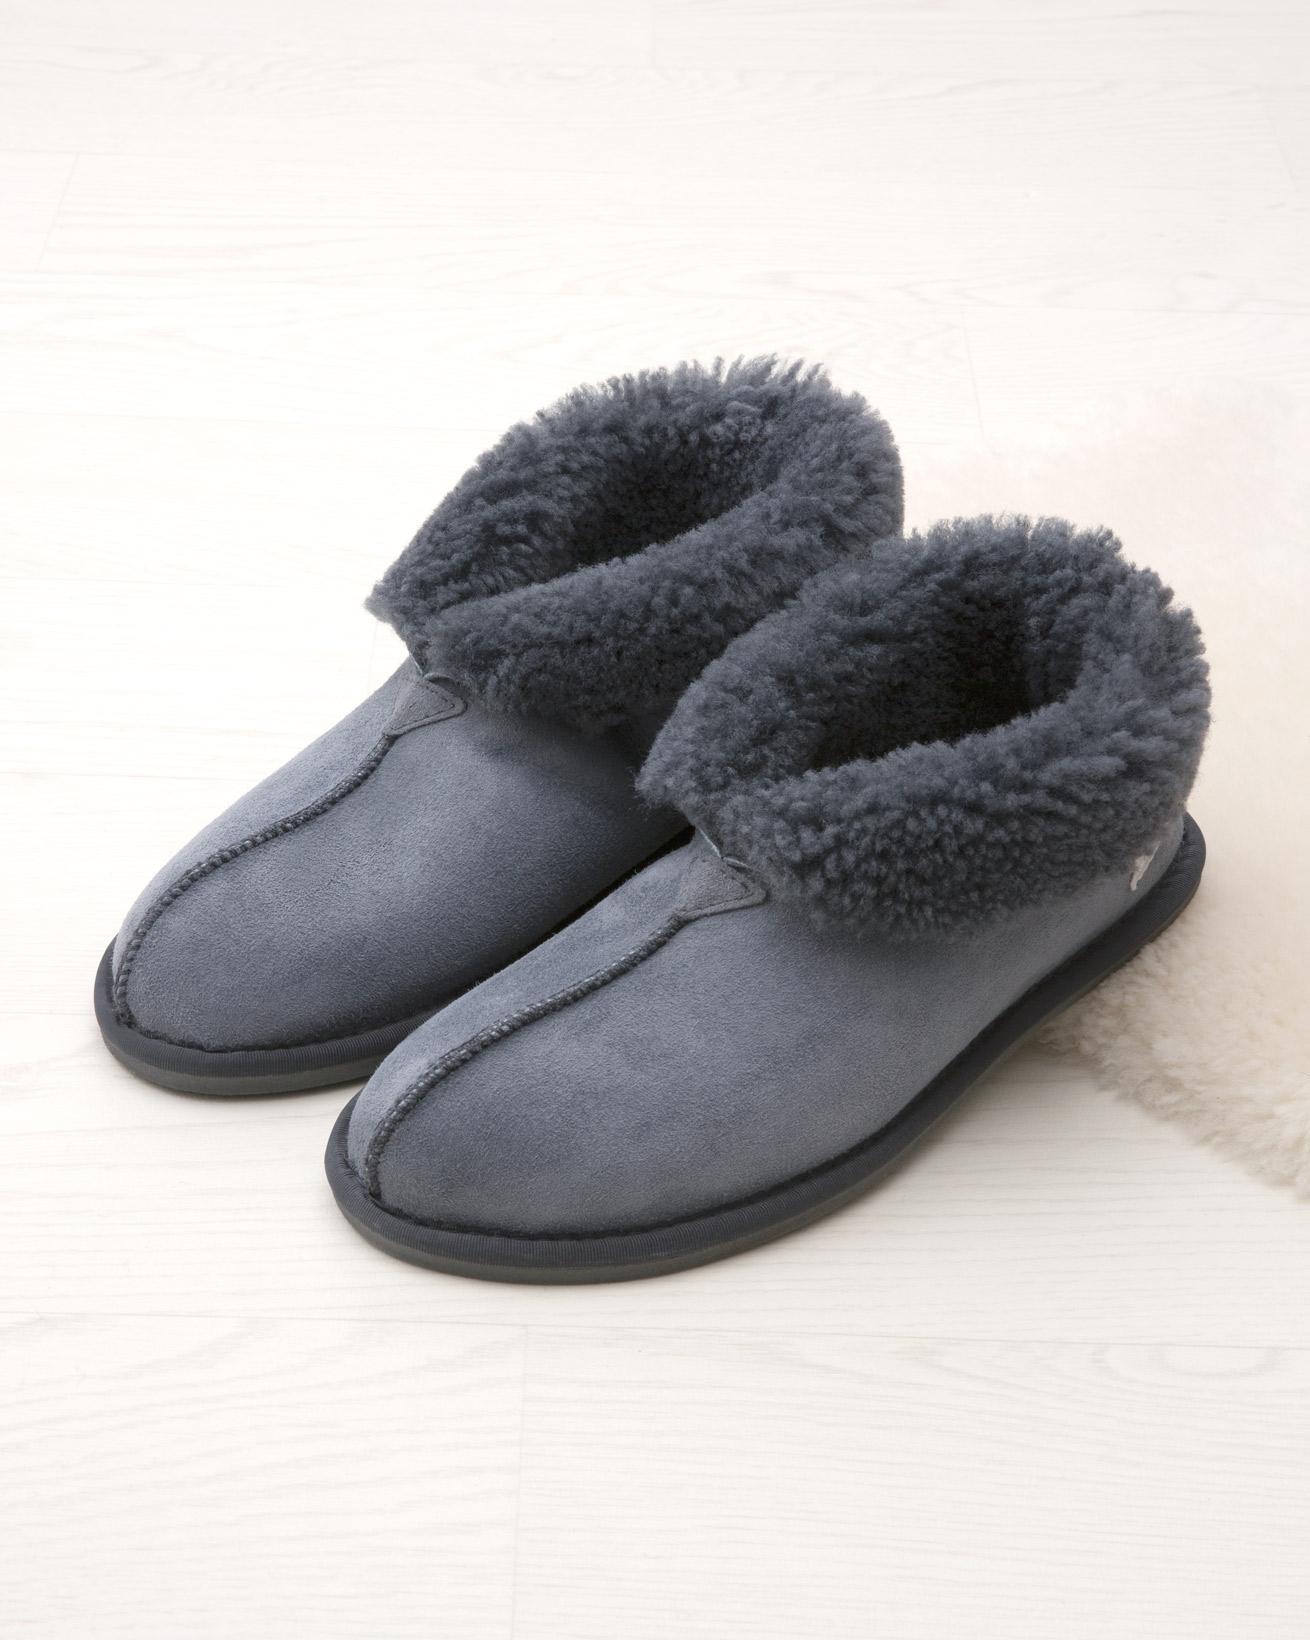 Men's Sheepskin Bootee Slippers